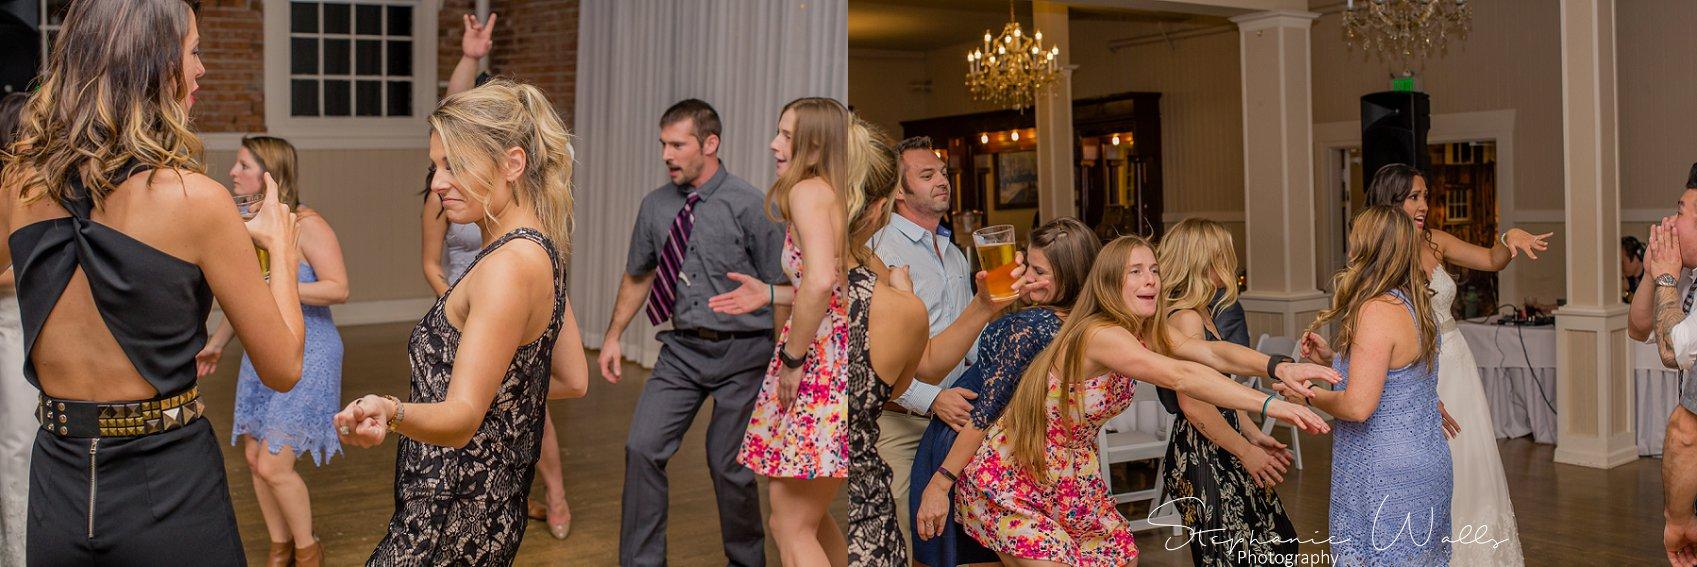 1st Dance Dancing 147 KK & Zack   Hollywood Schoolhouse Wedding   Woodinville, Wa Wedding Photographer